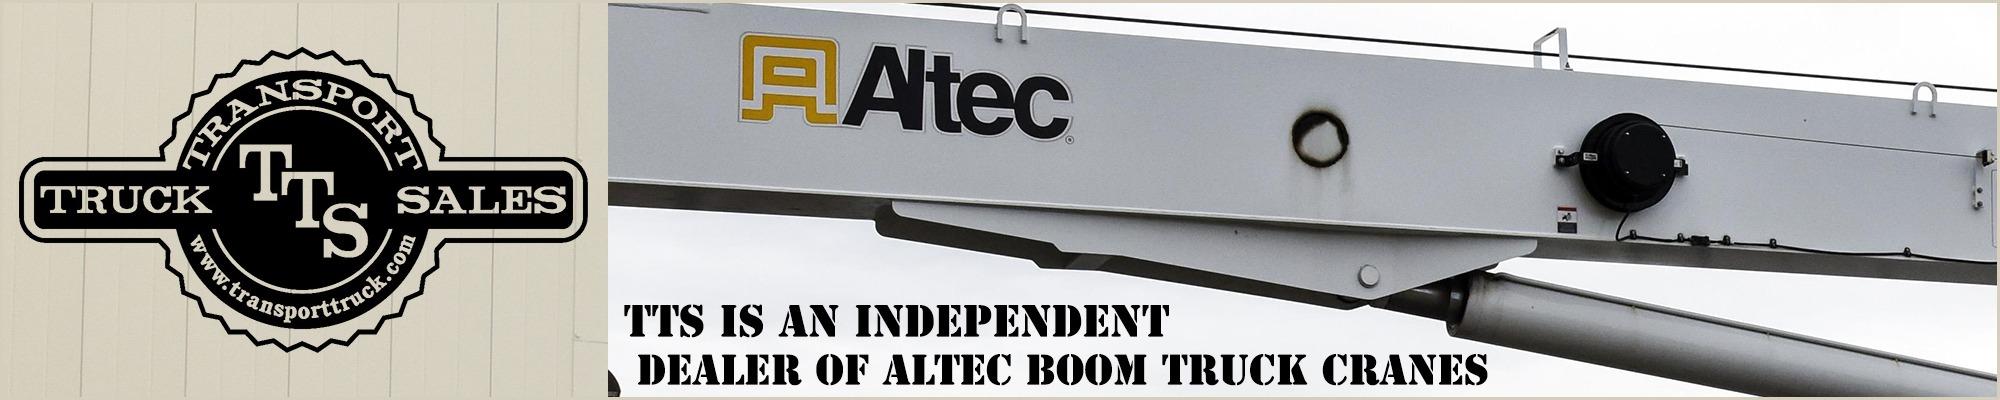 hight resolution of altec sponsored